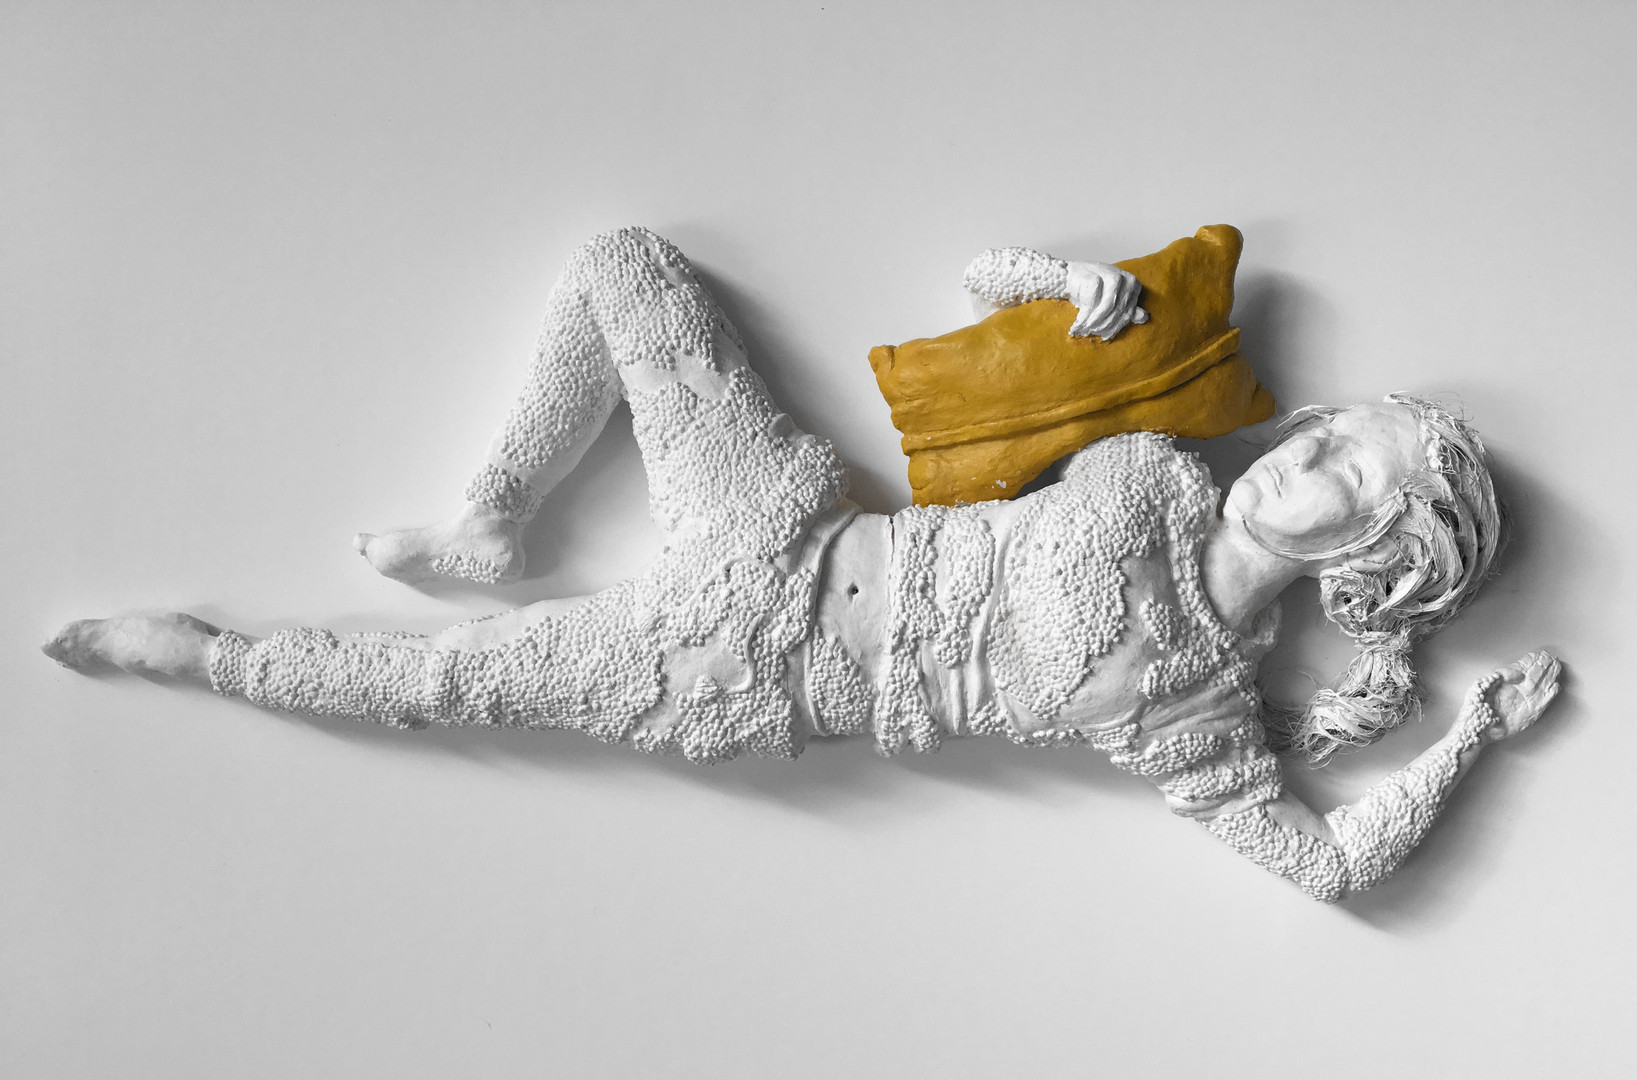 Sculpture Self-Portrait